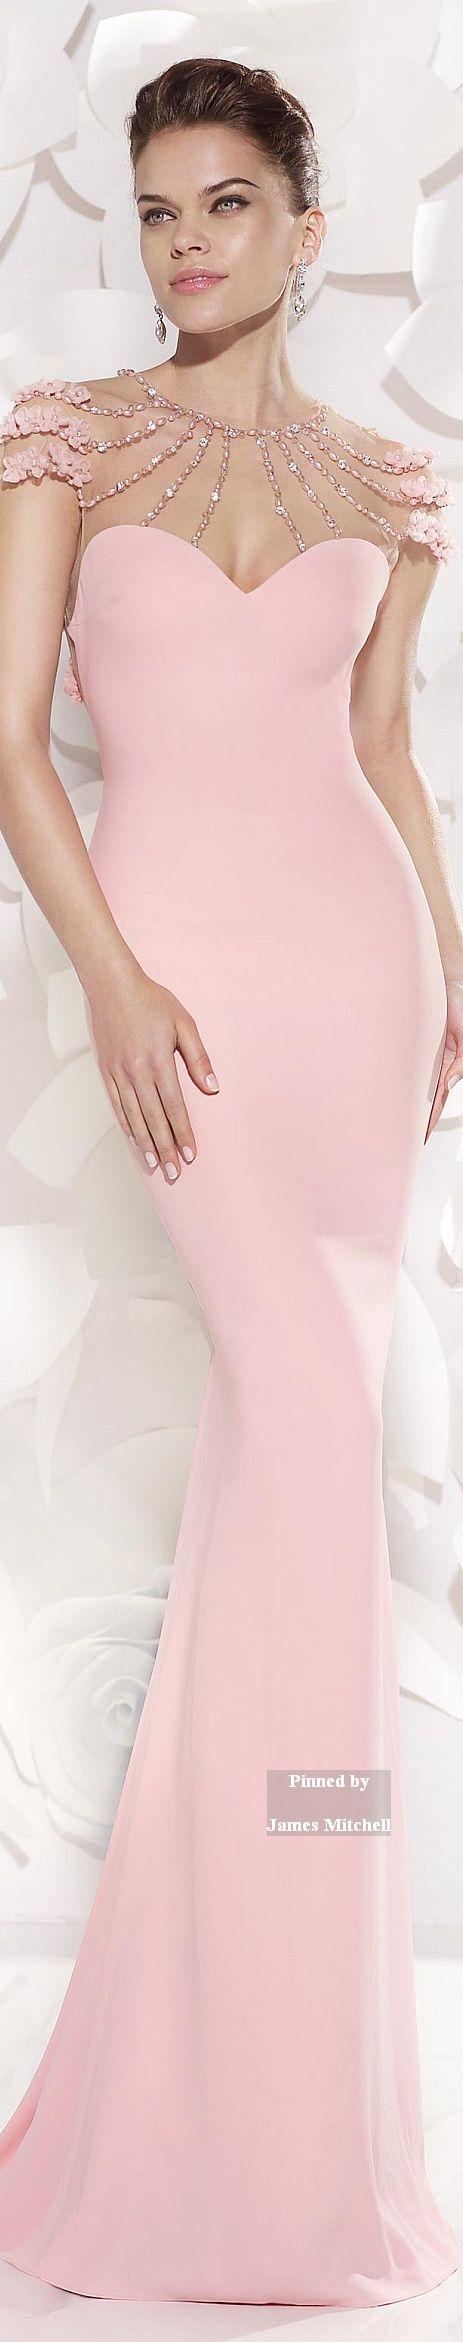 Tarik Ediz Collection 2015 | pink gown